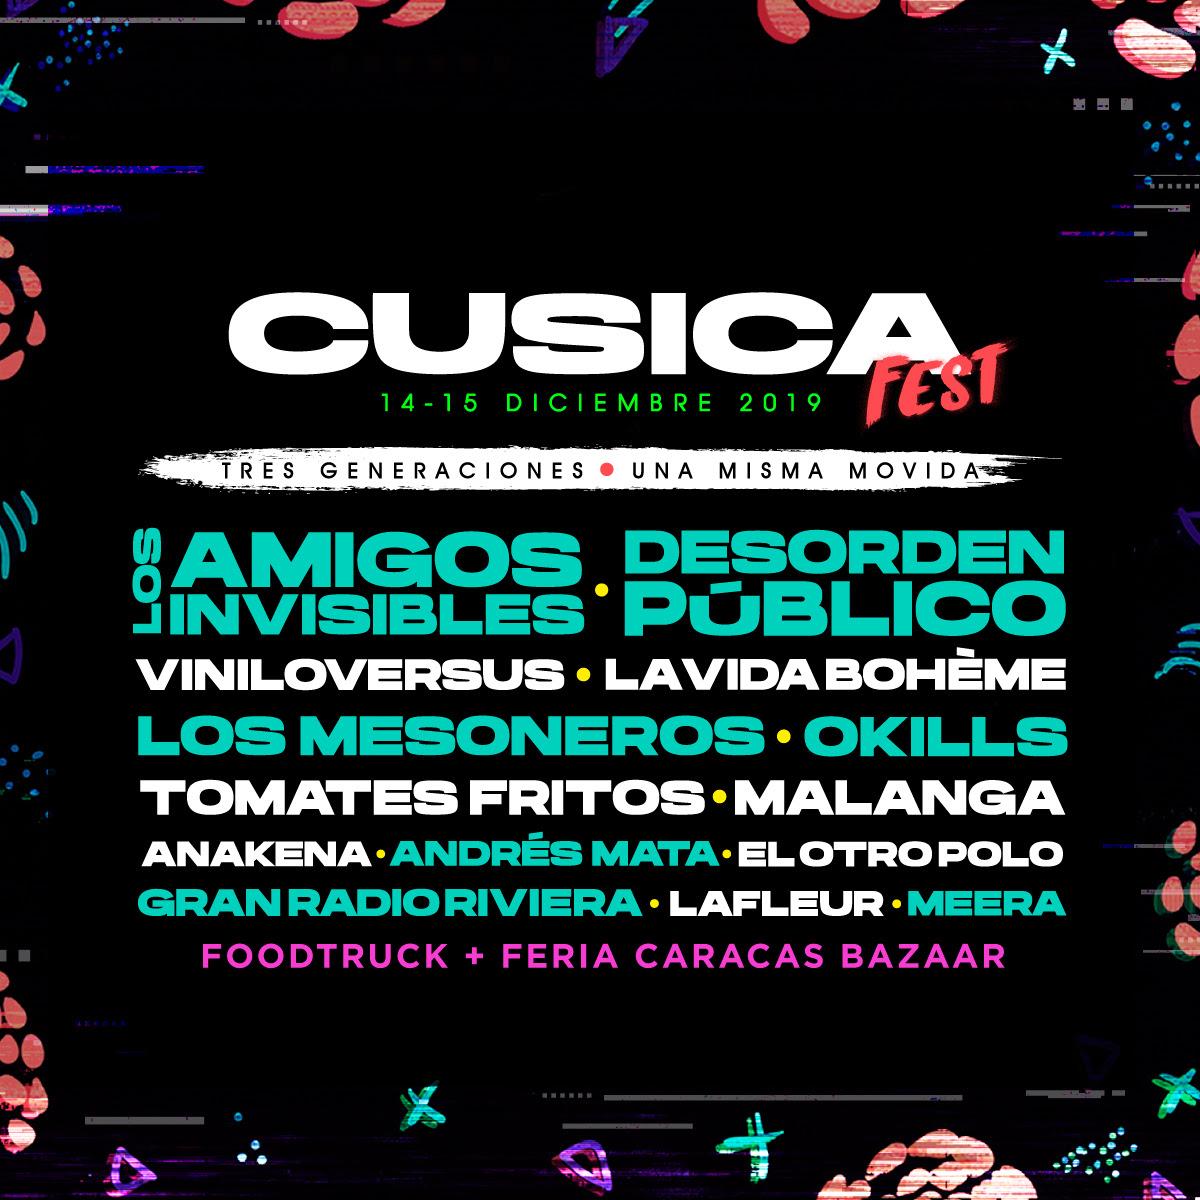 Cúsica Fest